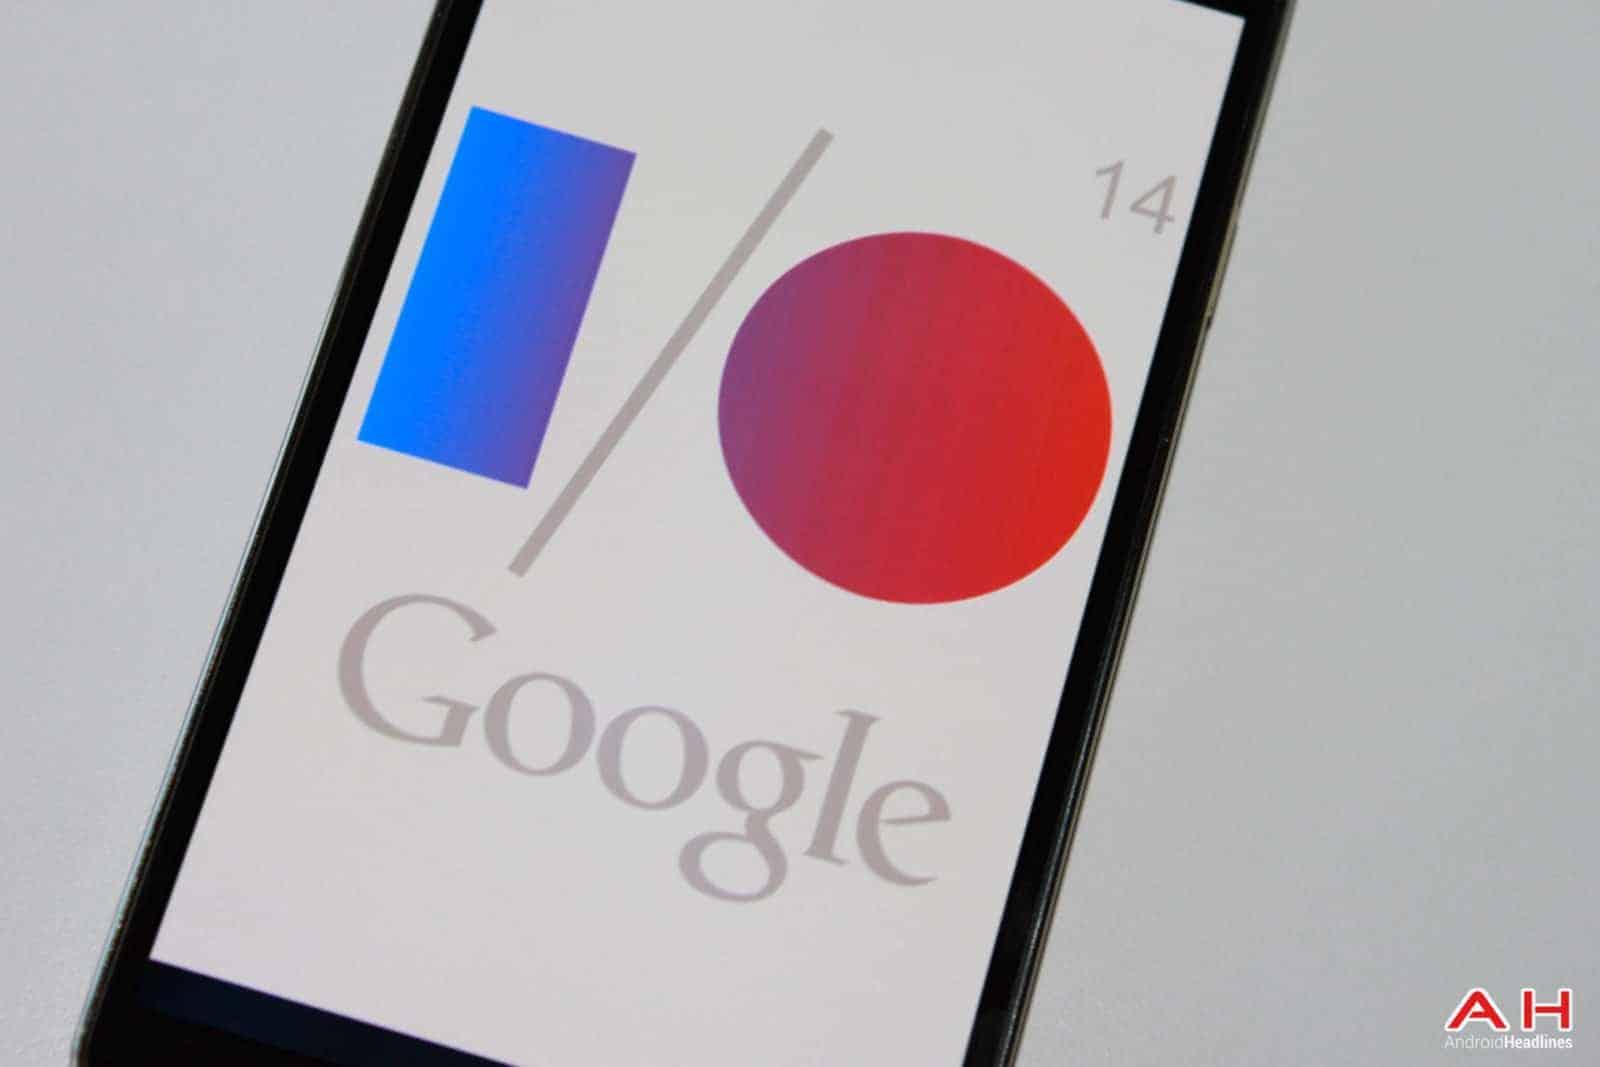 AH Google IO io  Logo 1.0